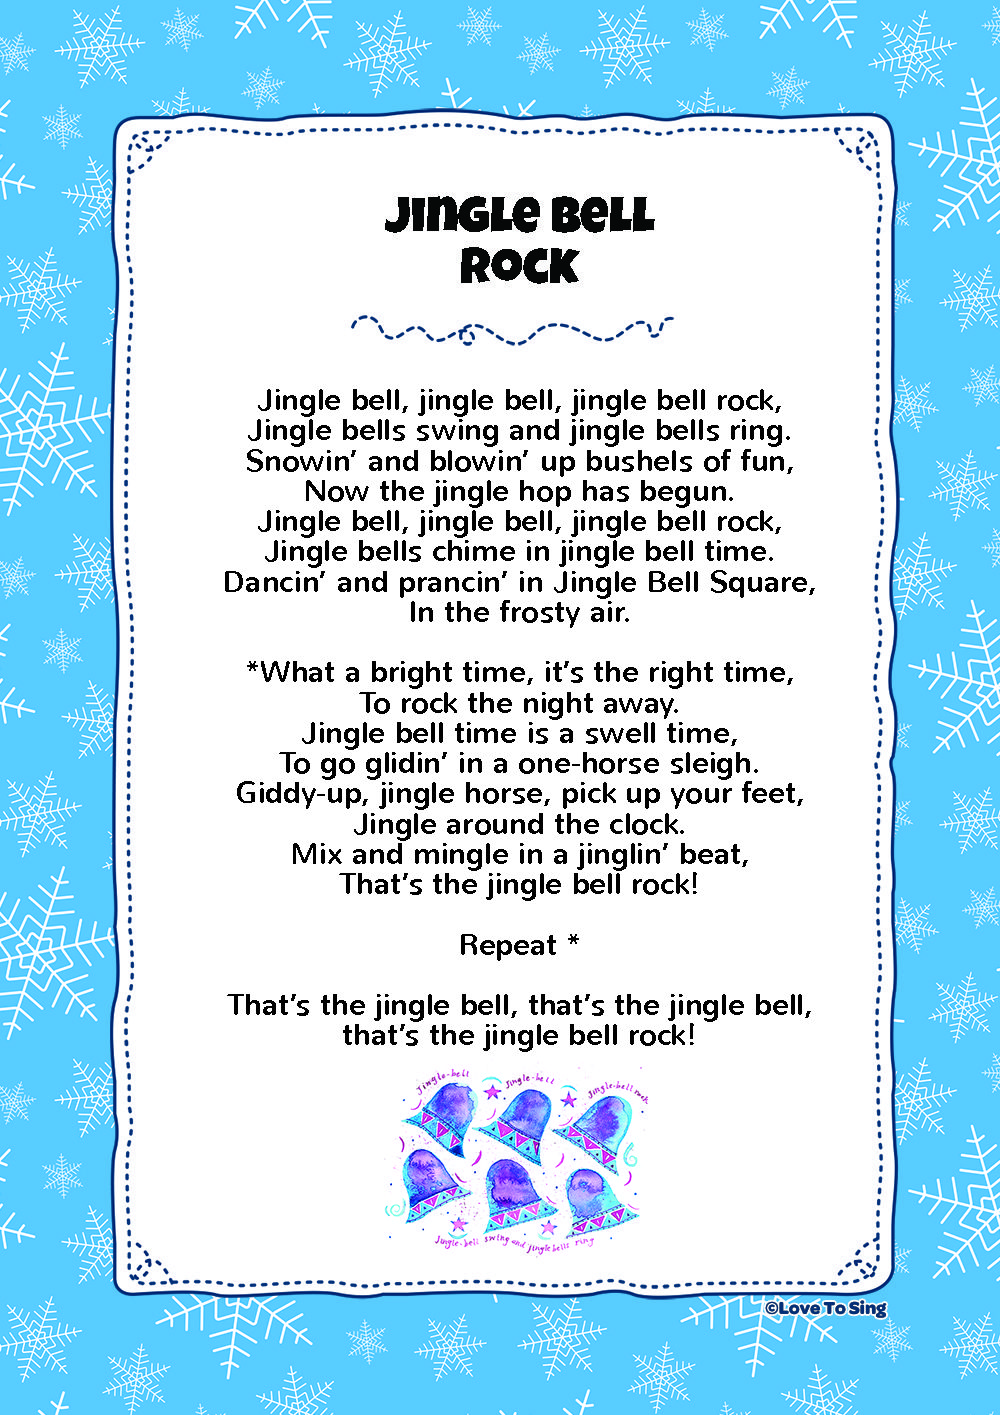 Jingle Bell Rock Kids Video Song With Free Lyrics Activities Christmas Lyrics Christmas Songs For Kids Christmas Songs Lyrics